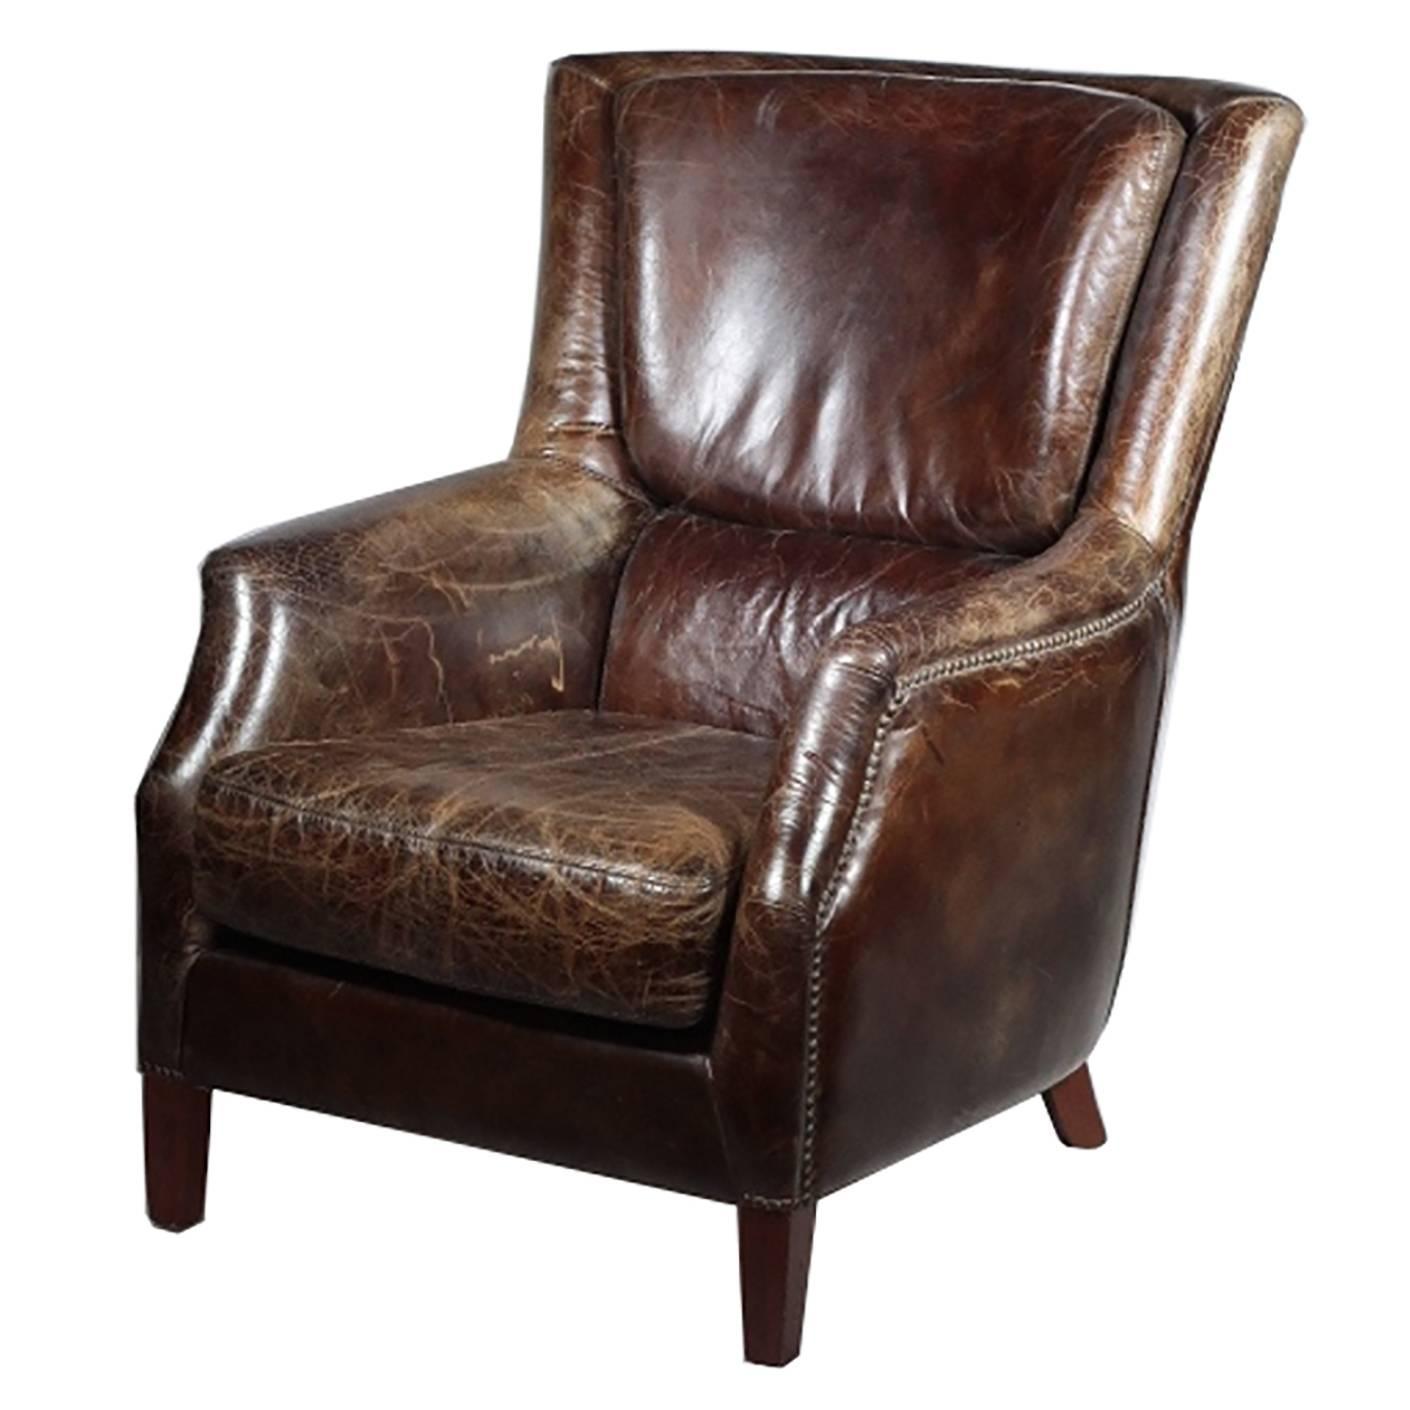 Custom High Grade Leather Chair At 1stdibs